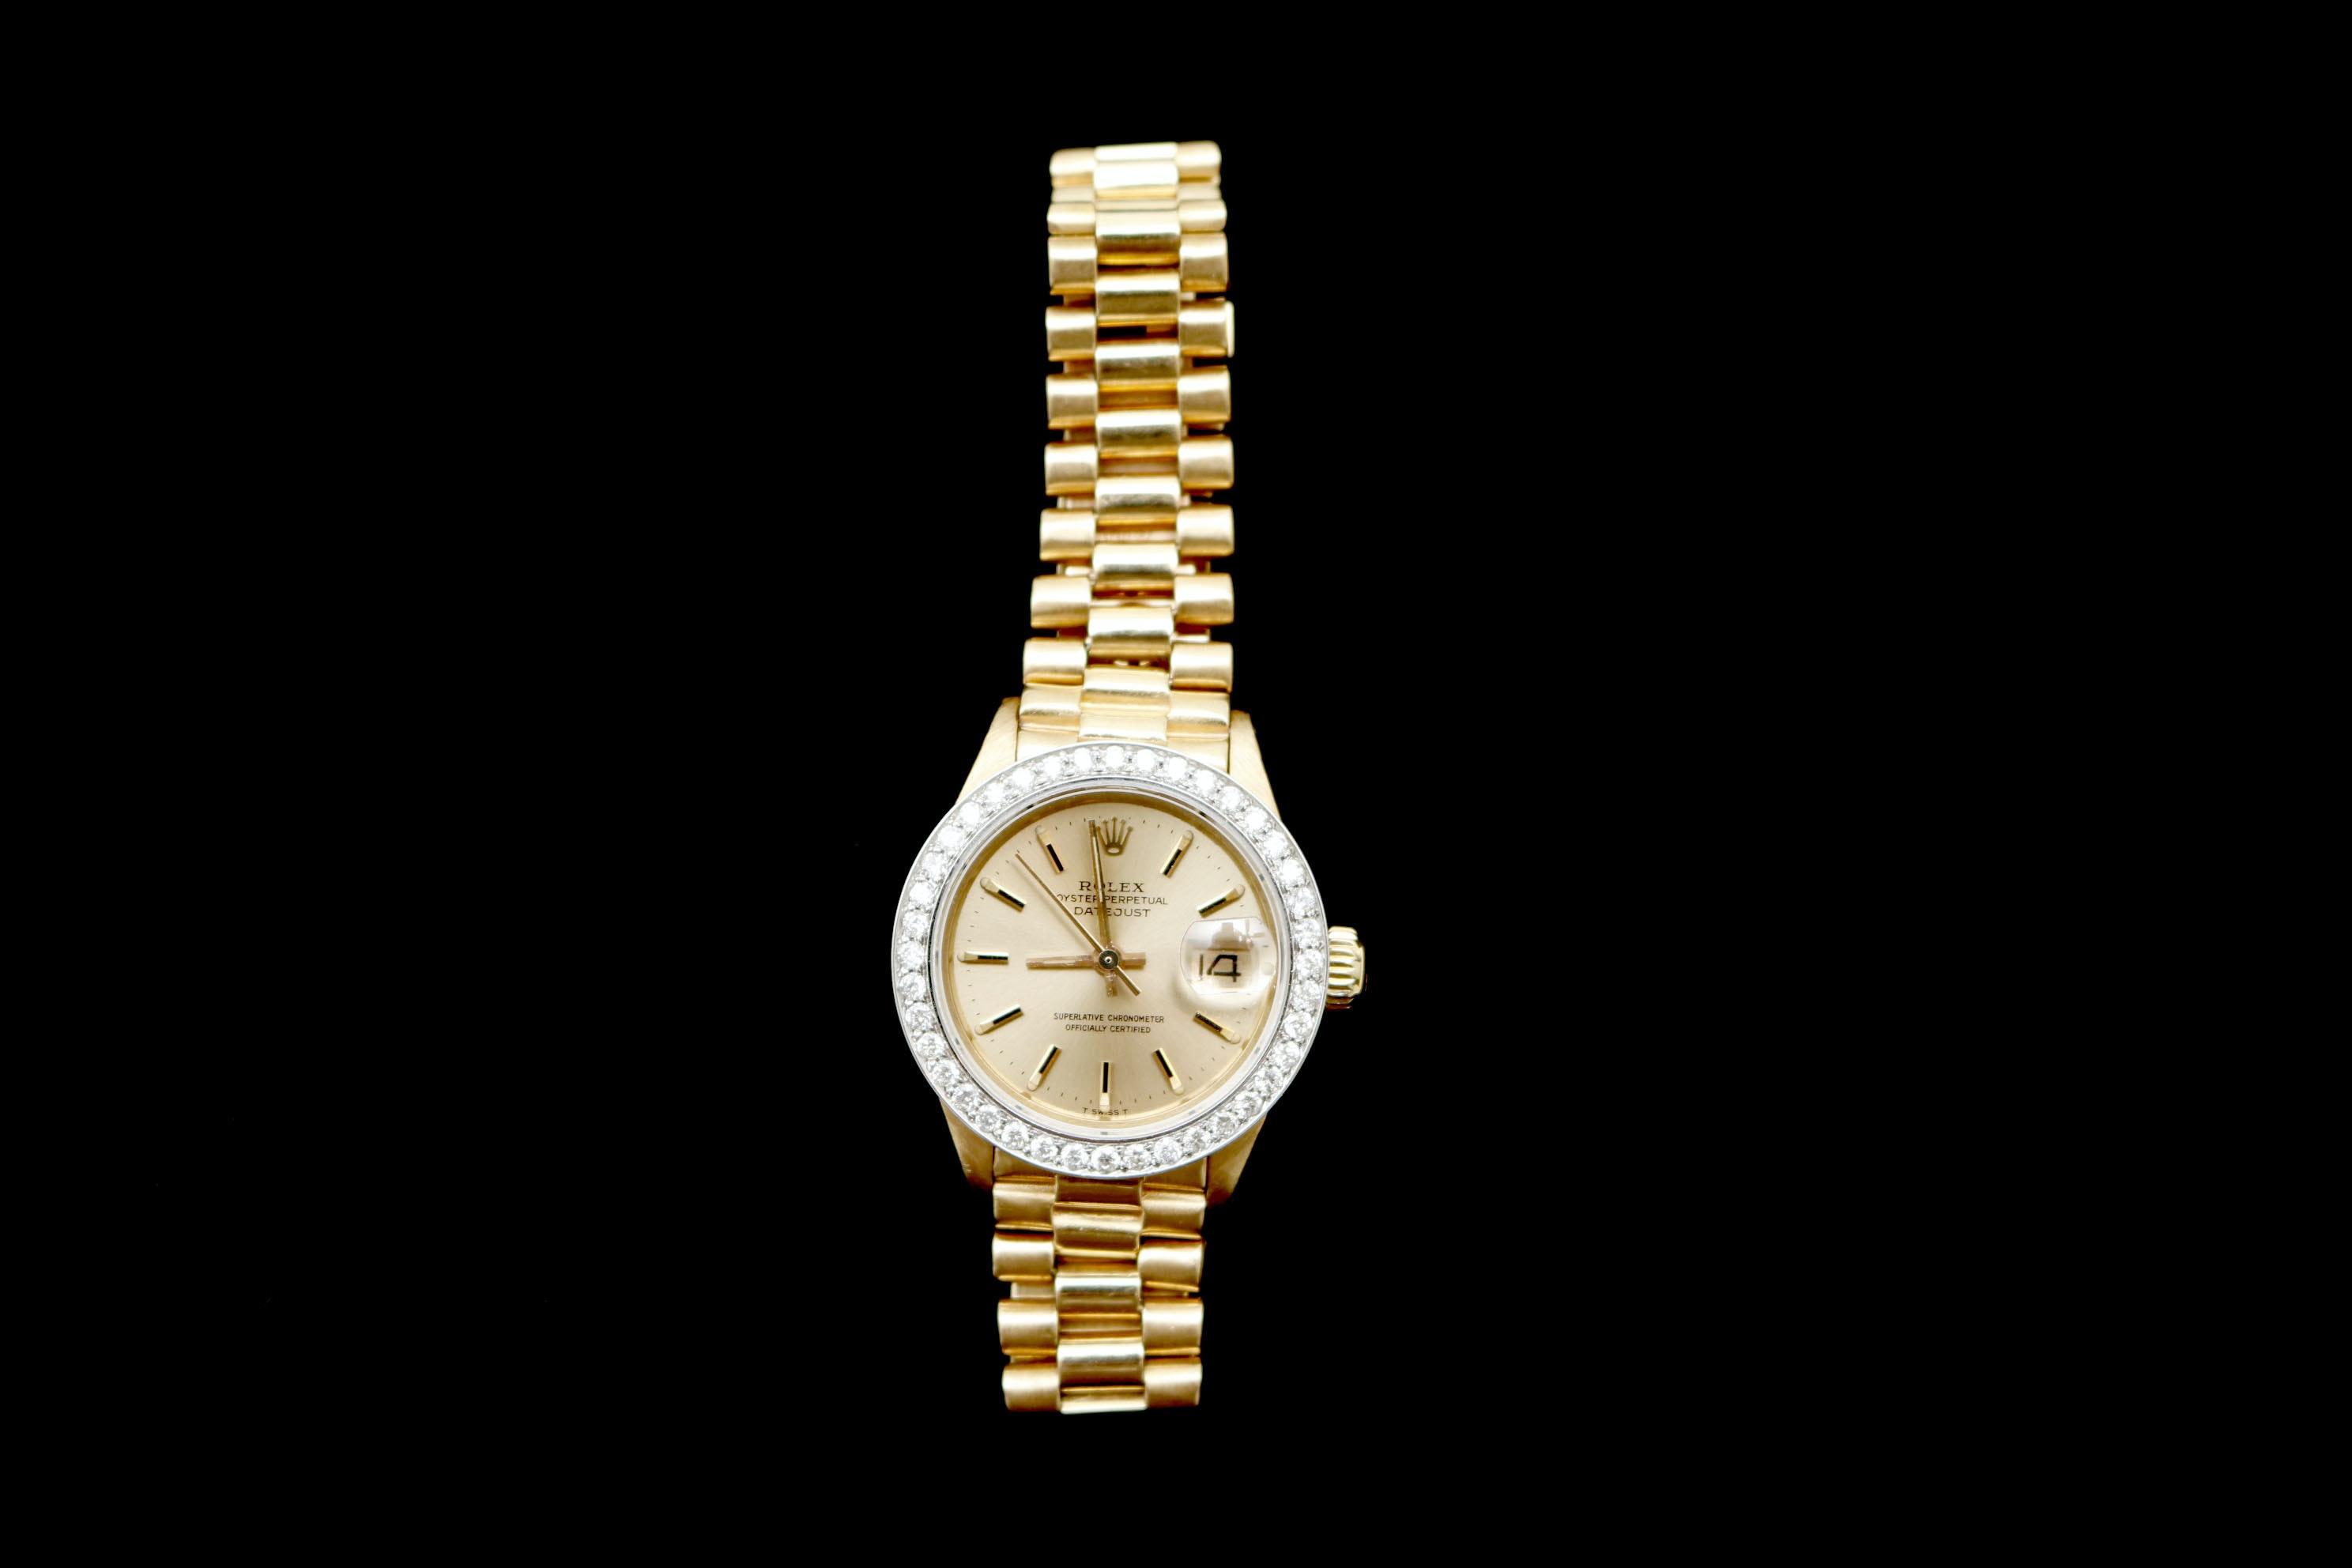 18K Yellow Gold and Diamond Rolex Wristwatch